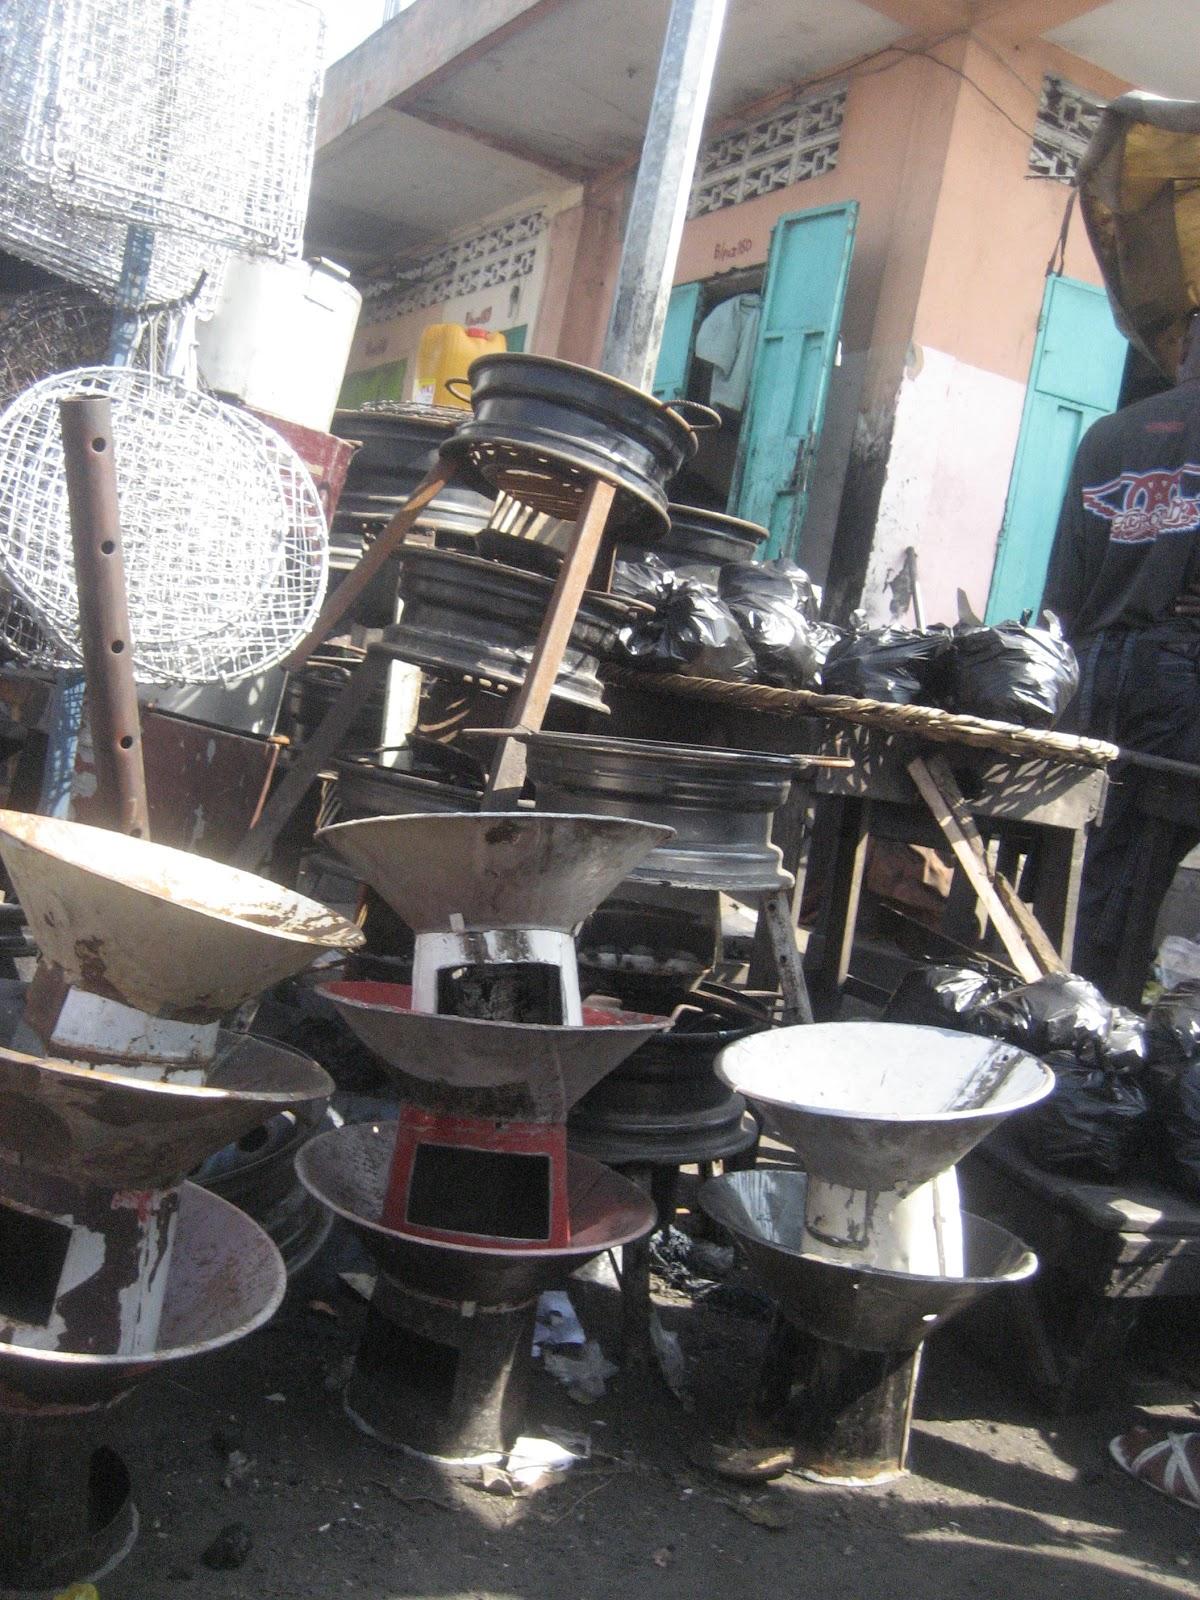 stovess.jpg